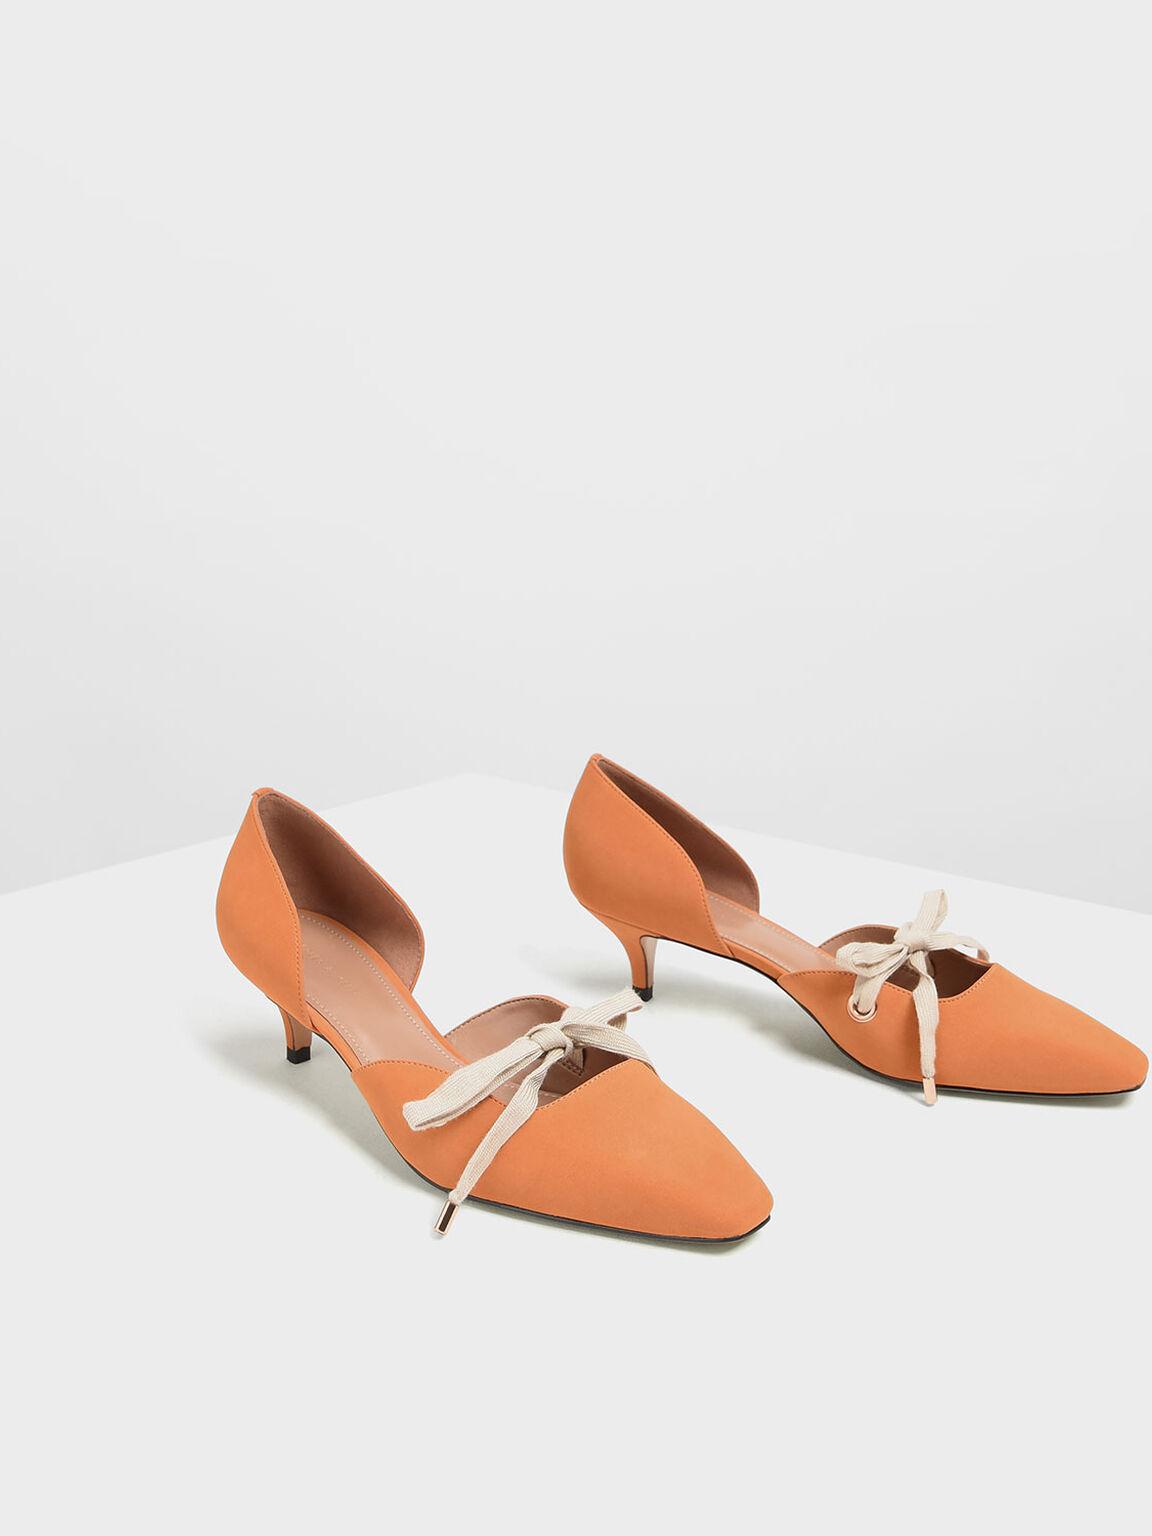 Bow Detail D'Orsay Kitten Heels, Orange, hi-res